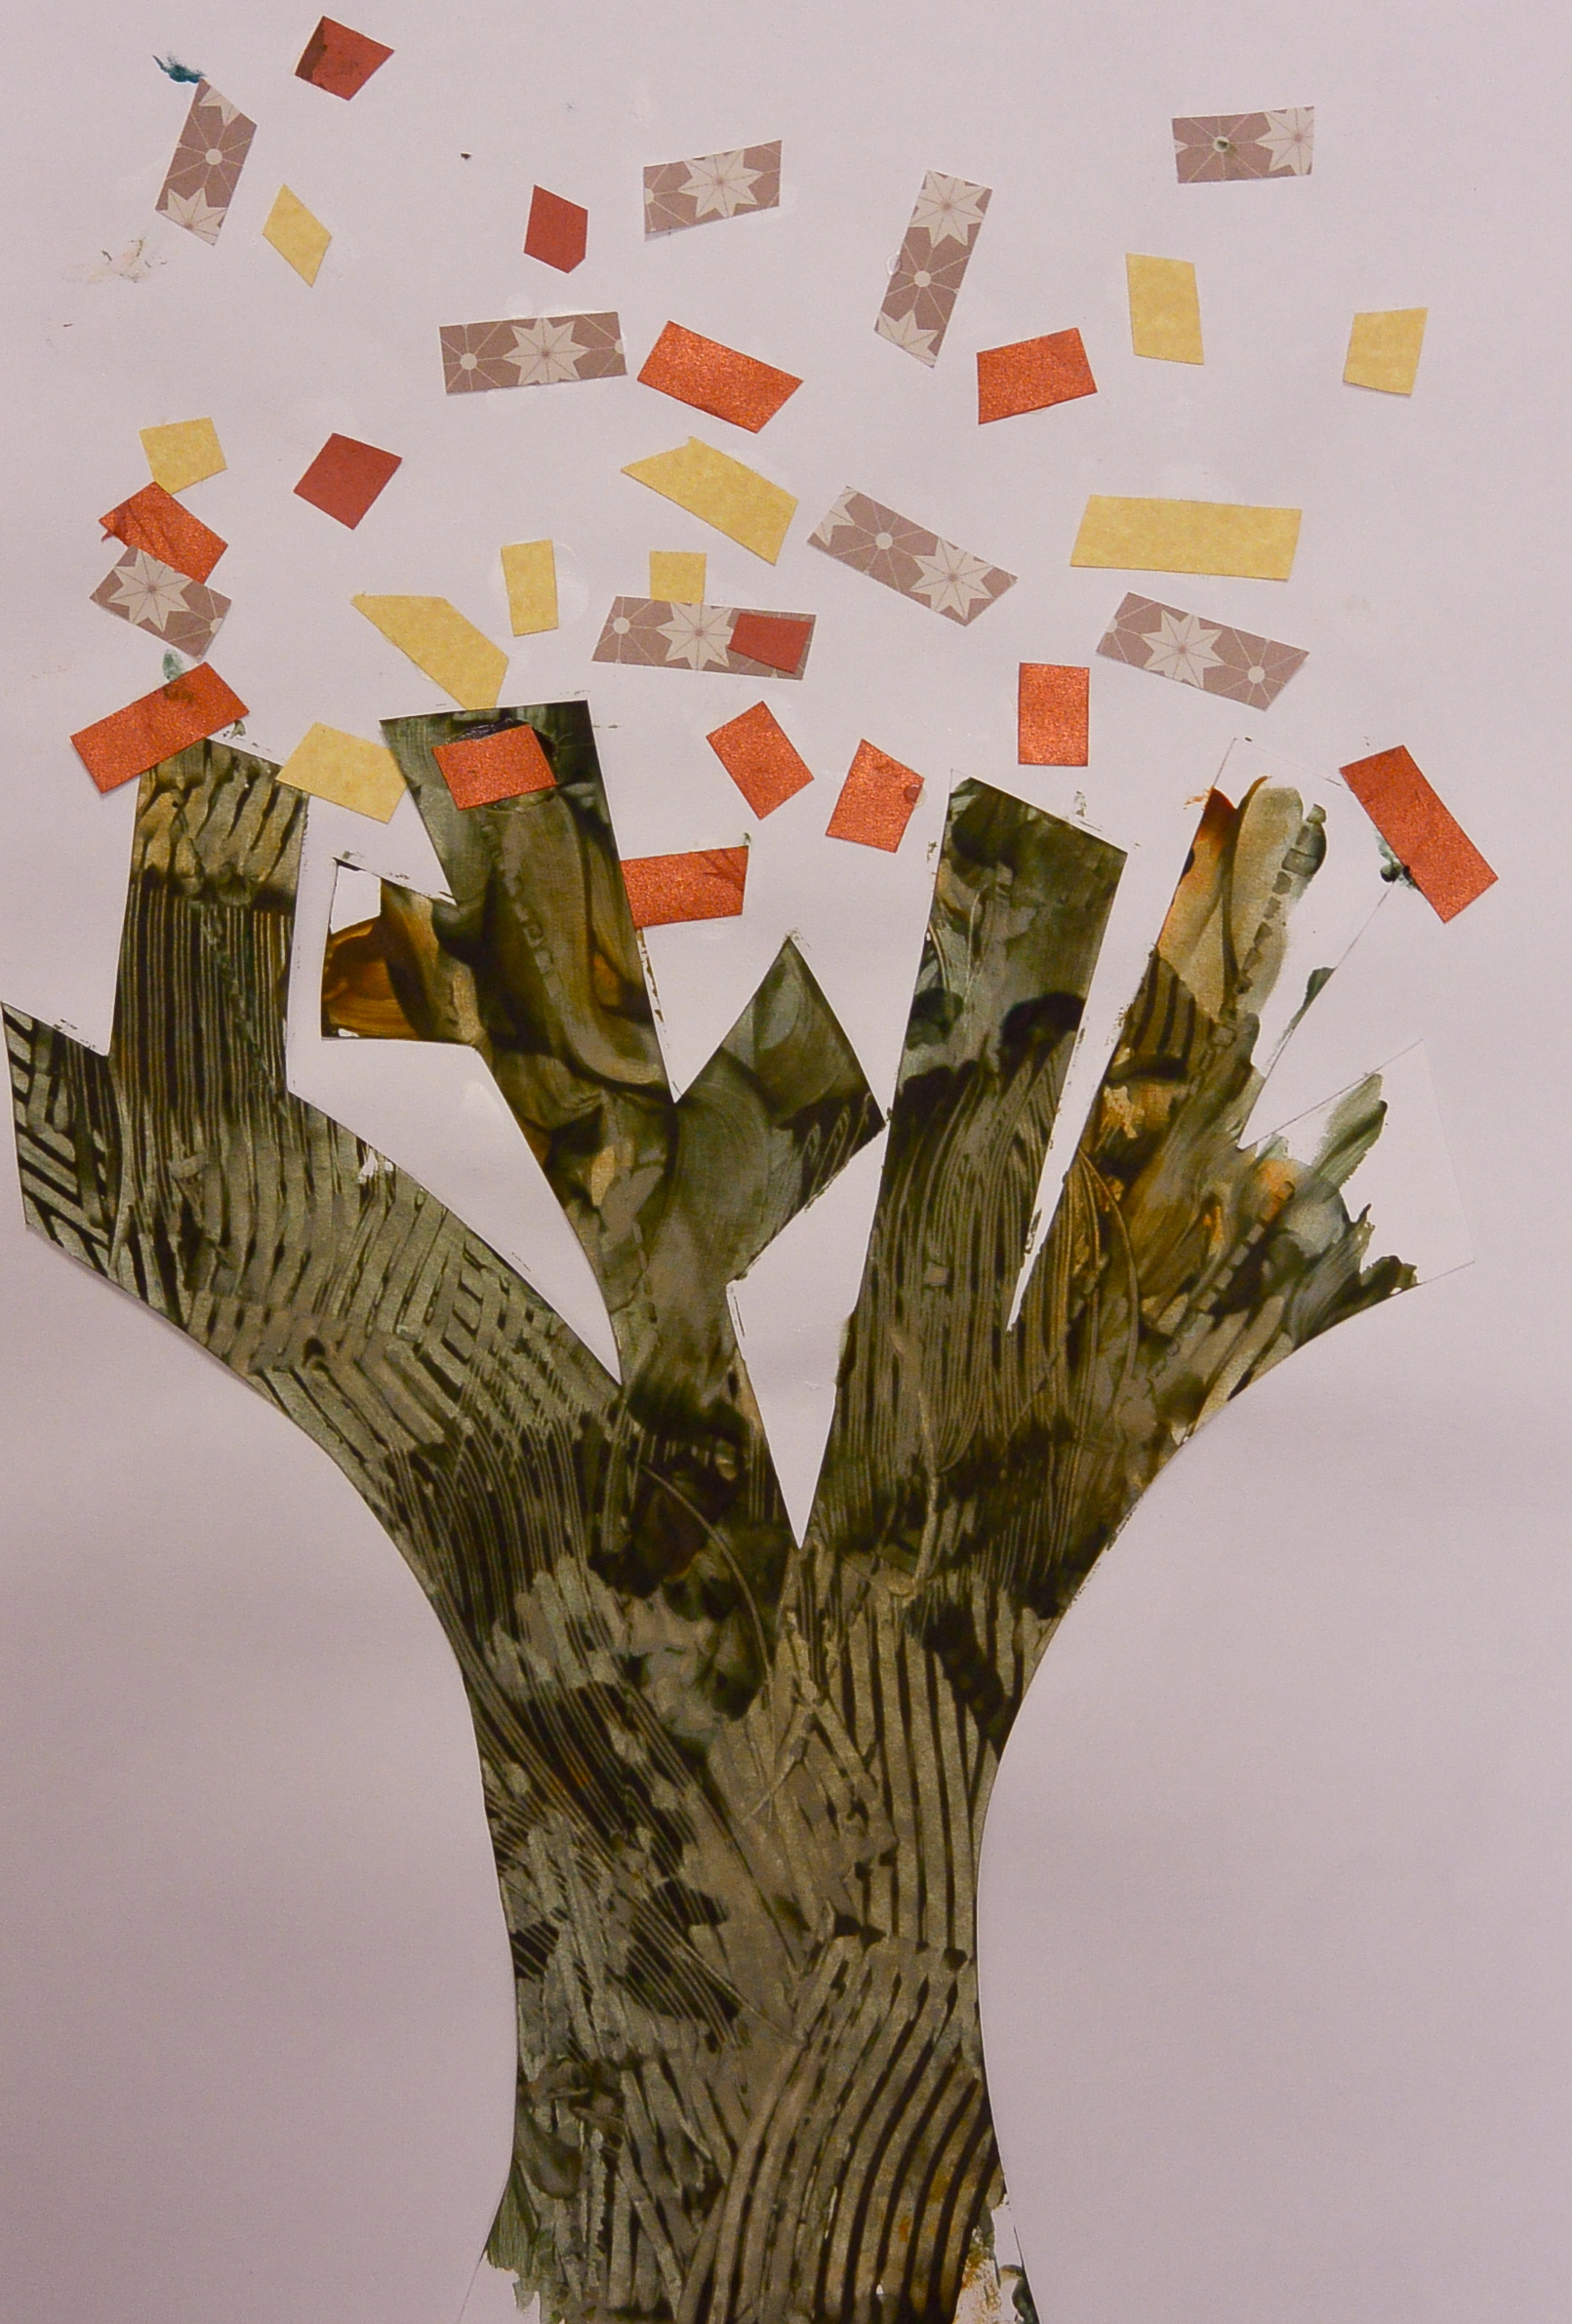 autumn art proj... Elementary Art Projects For Kids